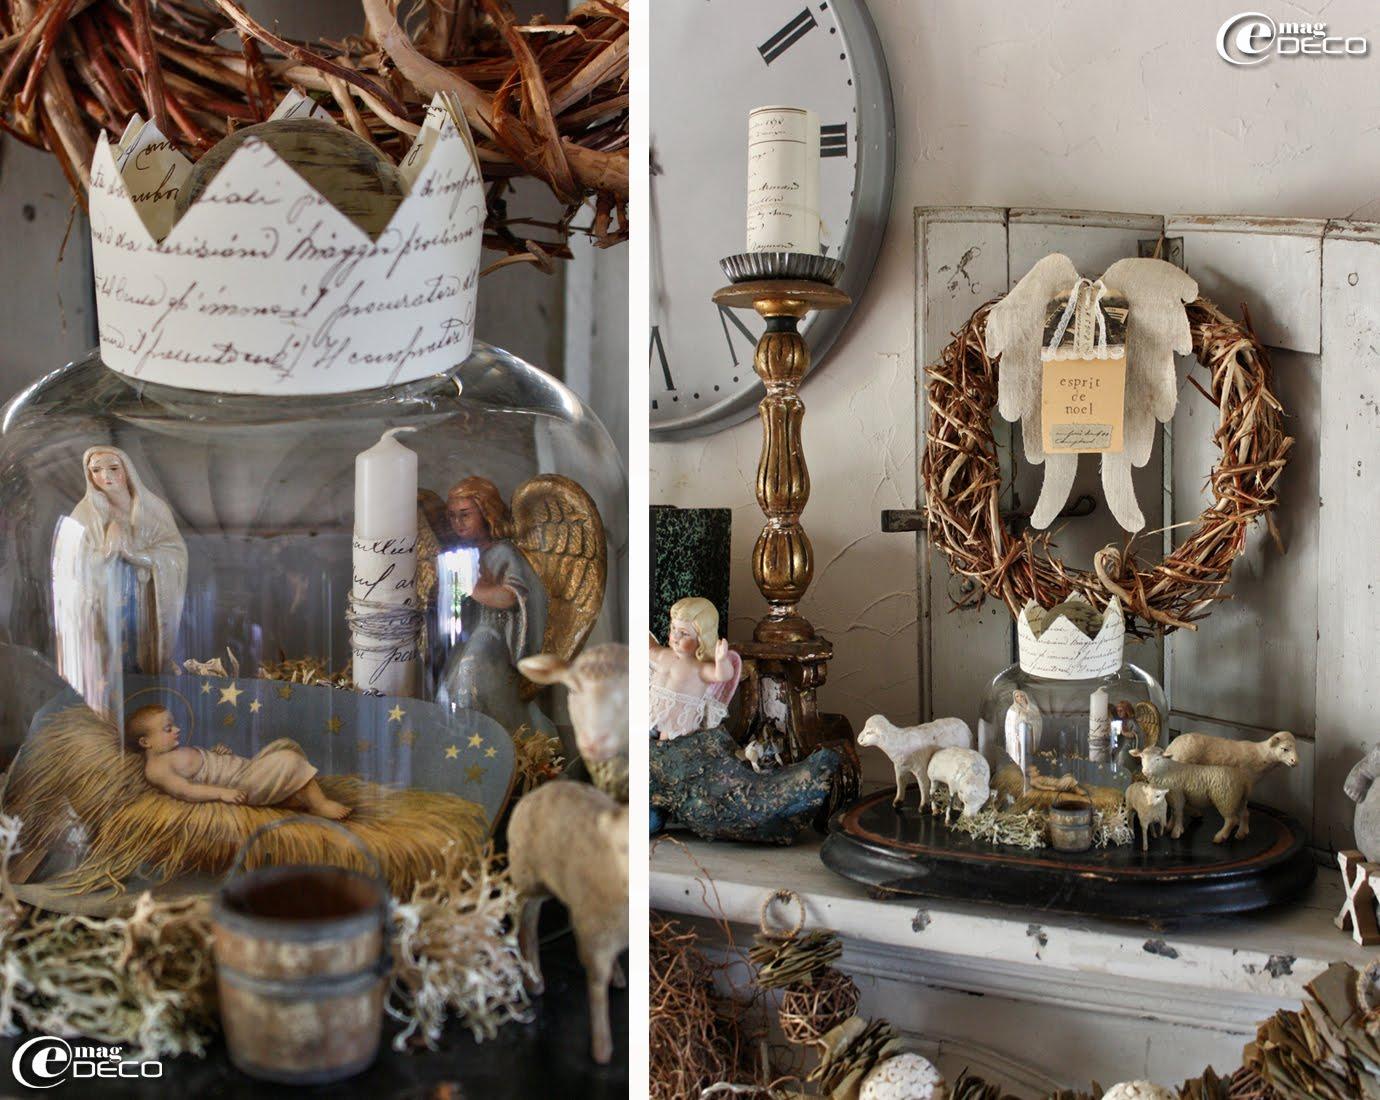 decoration de noel sous cloche. Black Bedroom Furniture Sets. Home Design Ideas